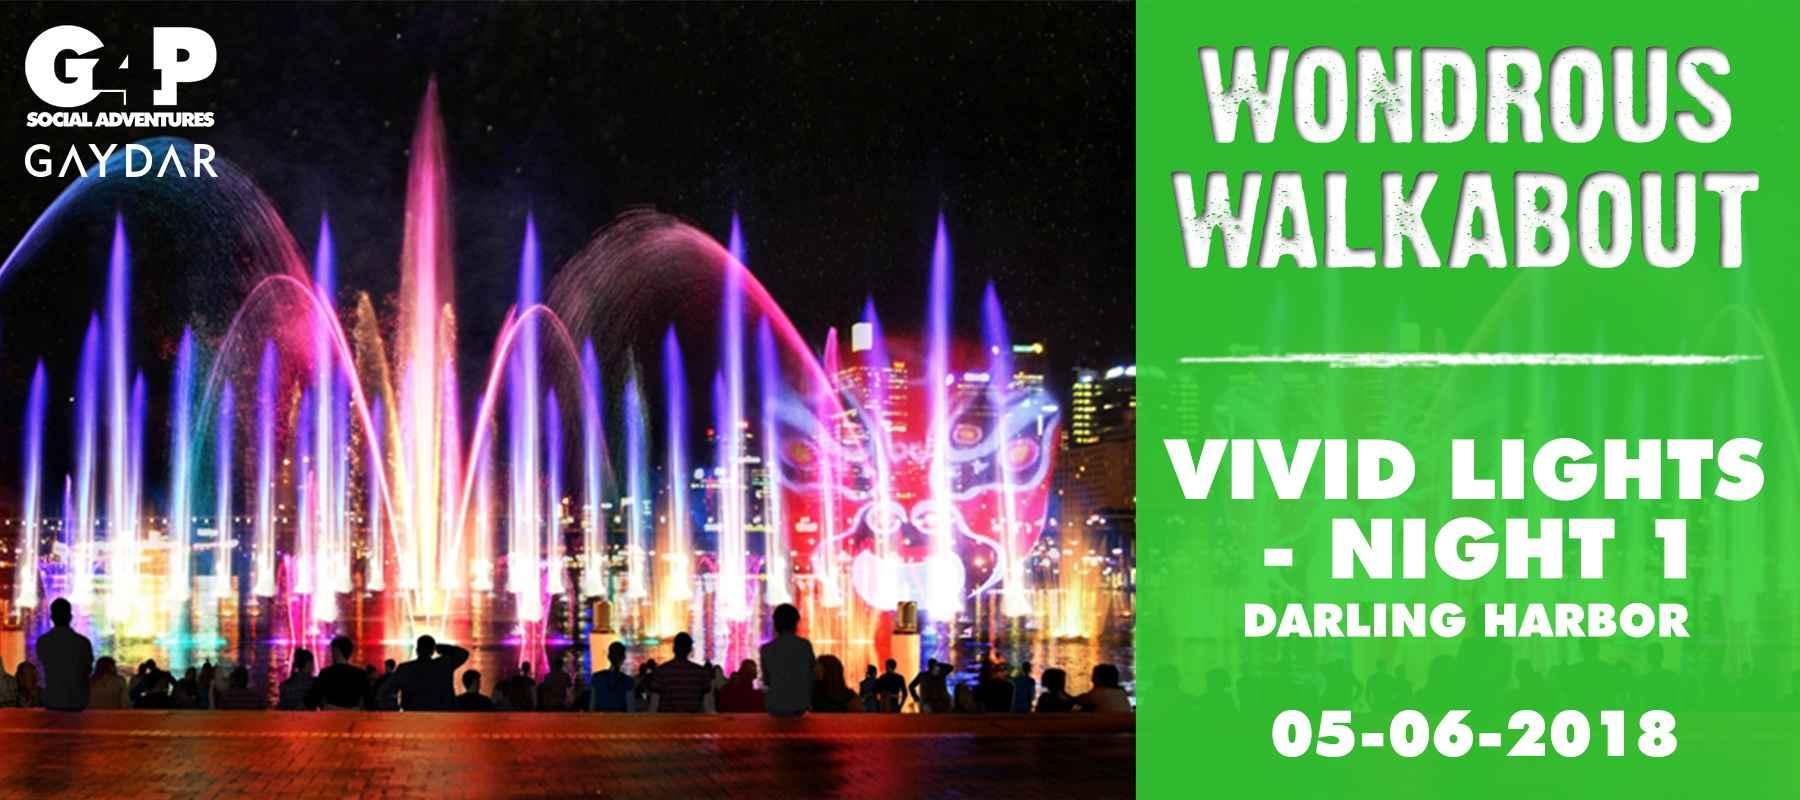 Wondrous Walkabout – Vivid Lights – Night 1